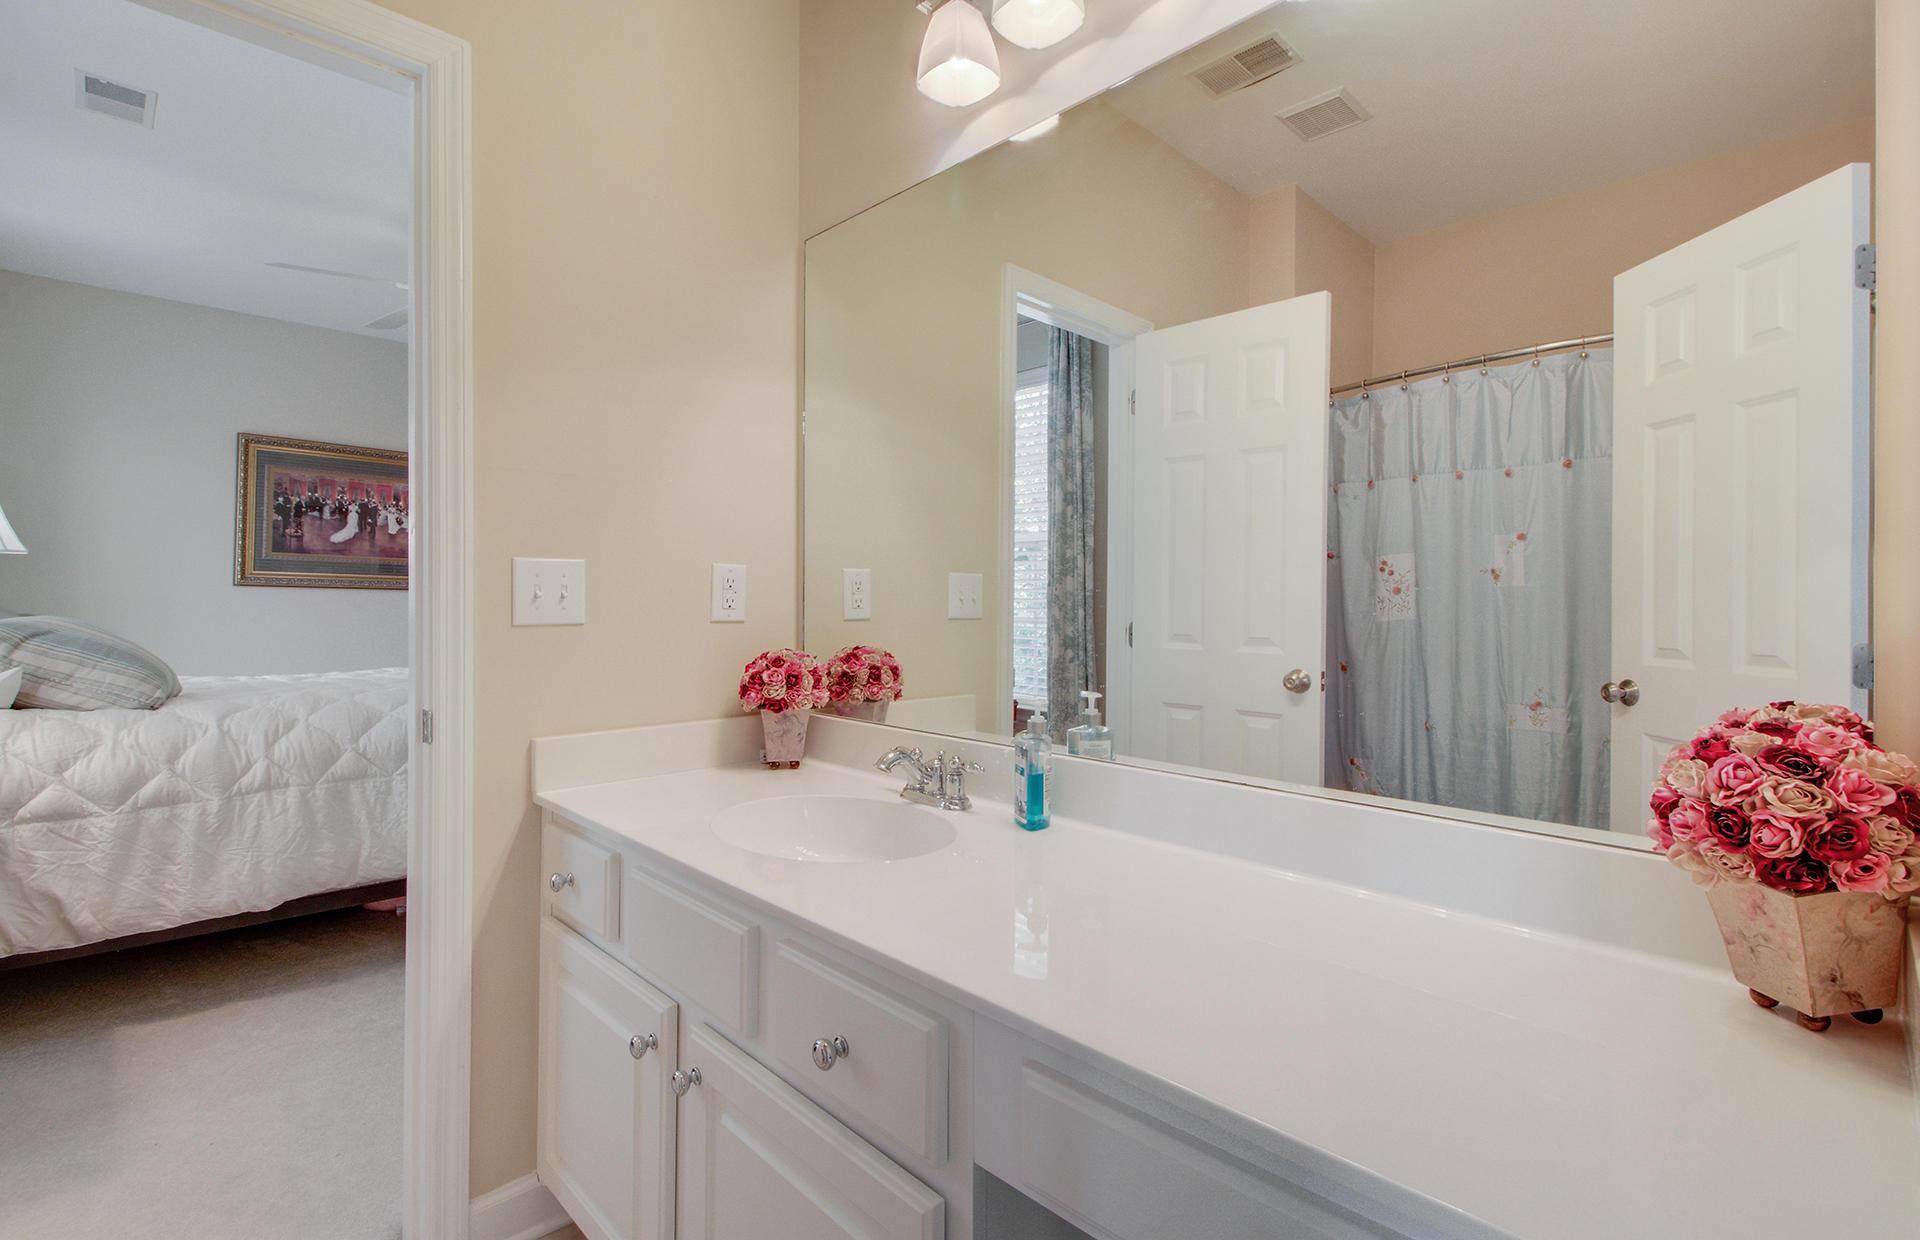 Dunes West Homes For Sale - 145 Fresh Meadow, Mount Pleasant, SC - 29